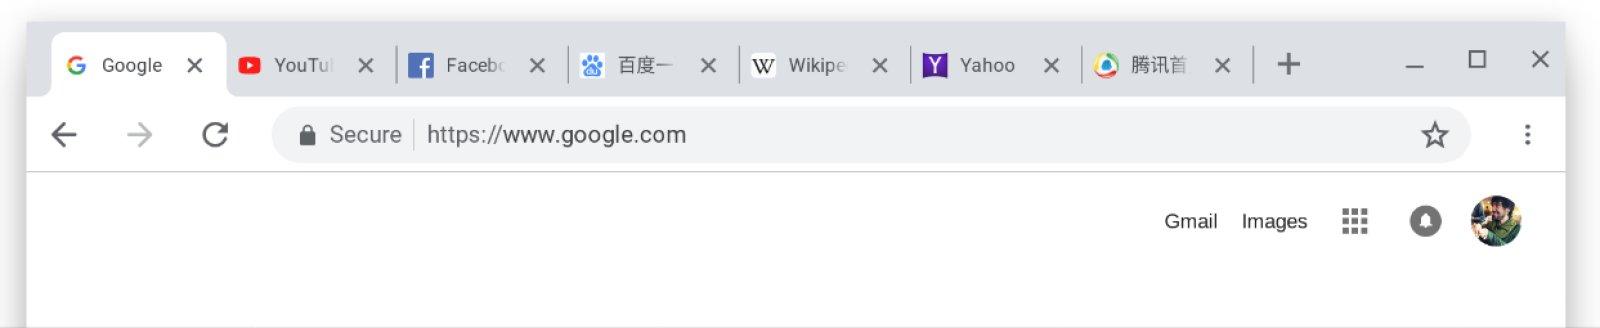 Google Chrome Testa ACUM NOUL Design 350731 1